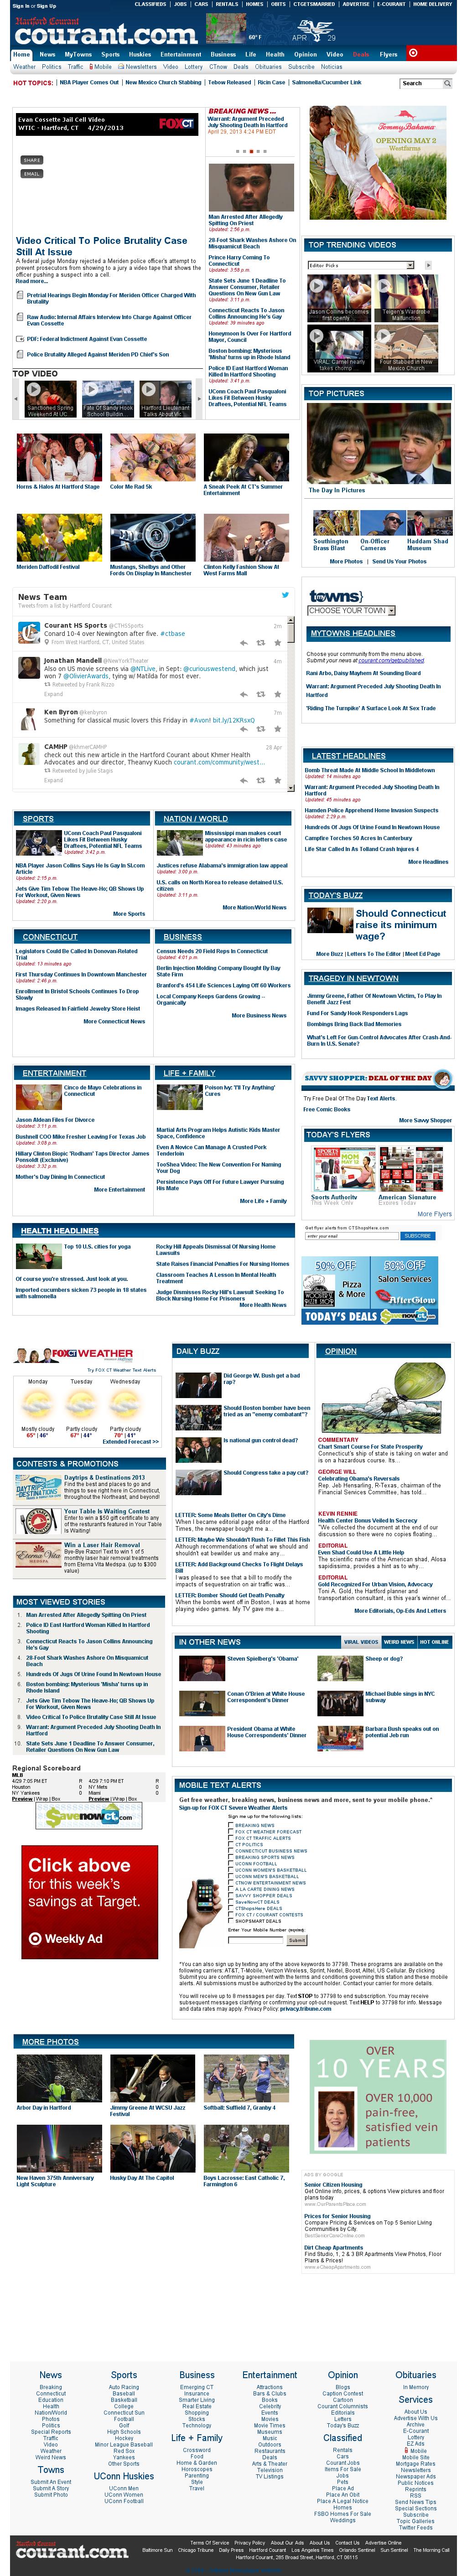 Hartford Courant at Monday April 29, 2013, 9:08 p.m. UTC